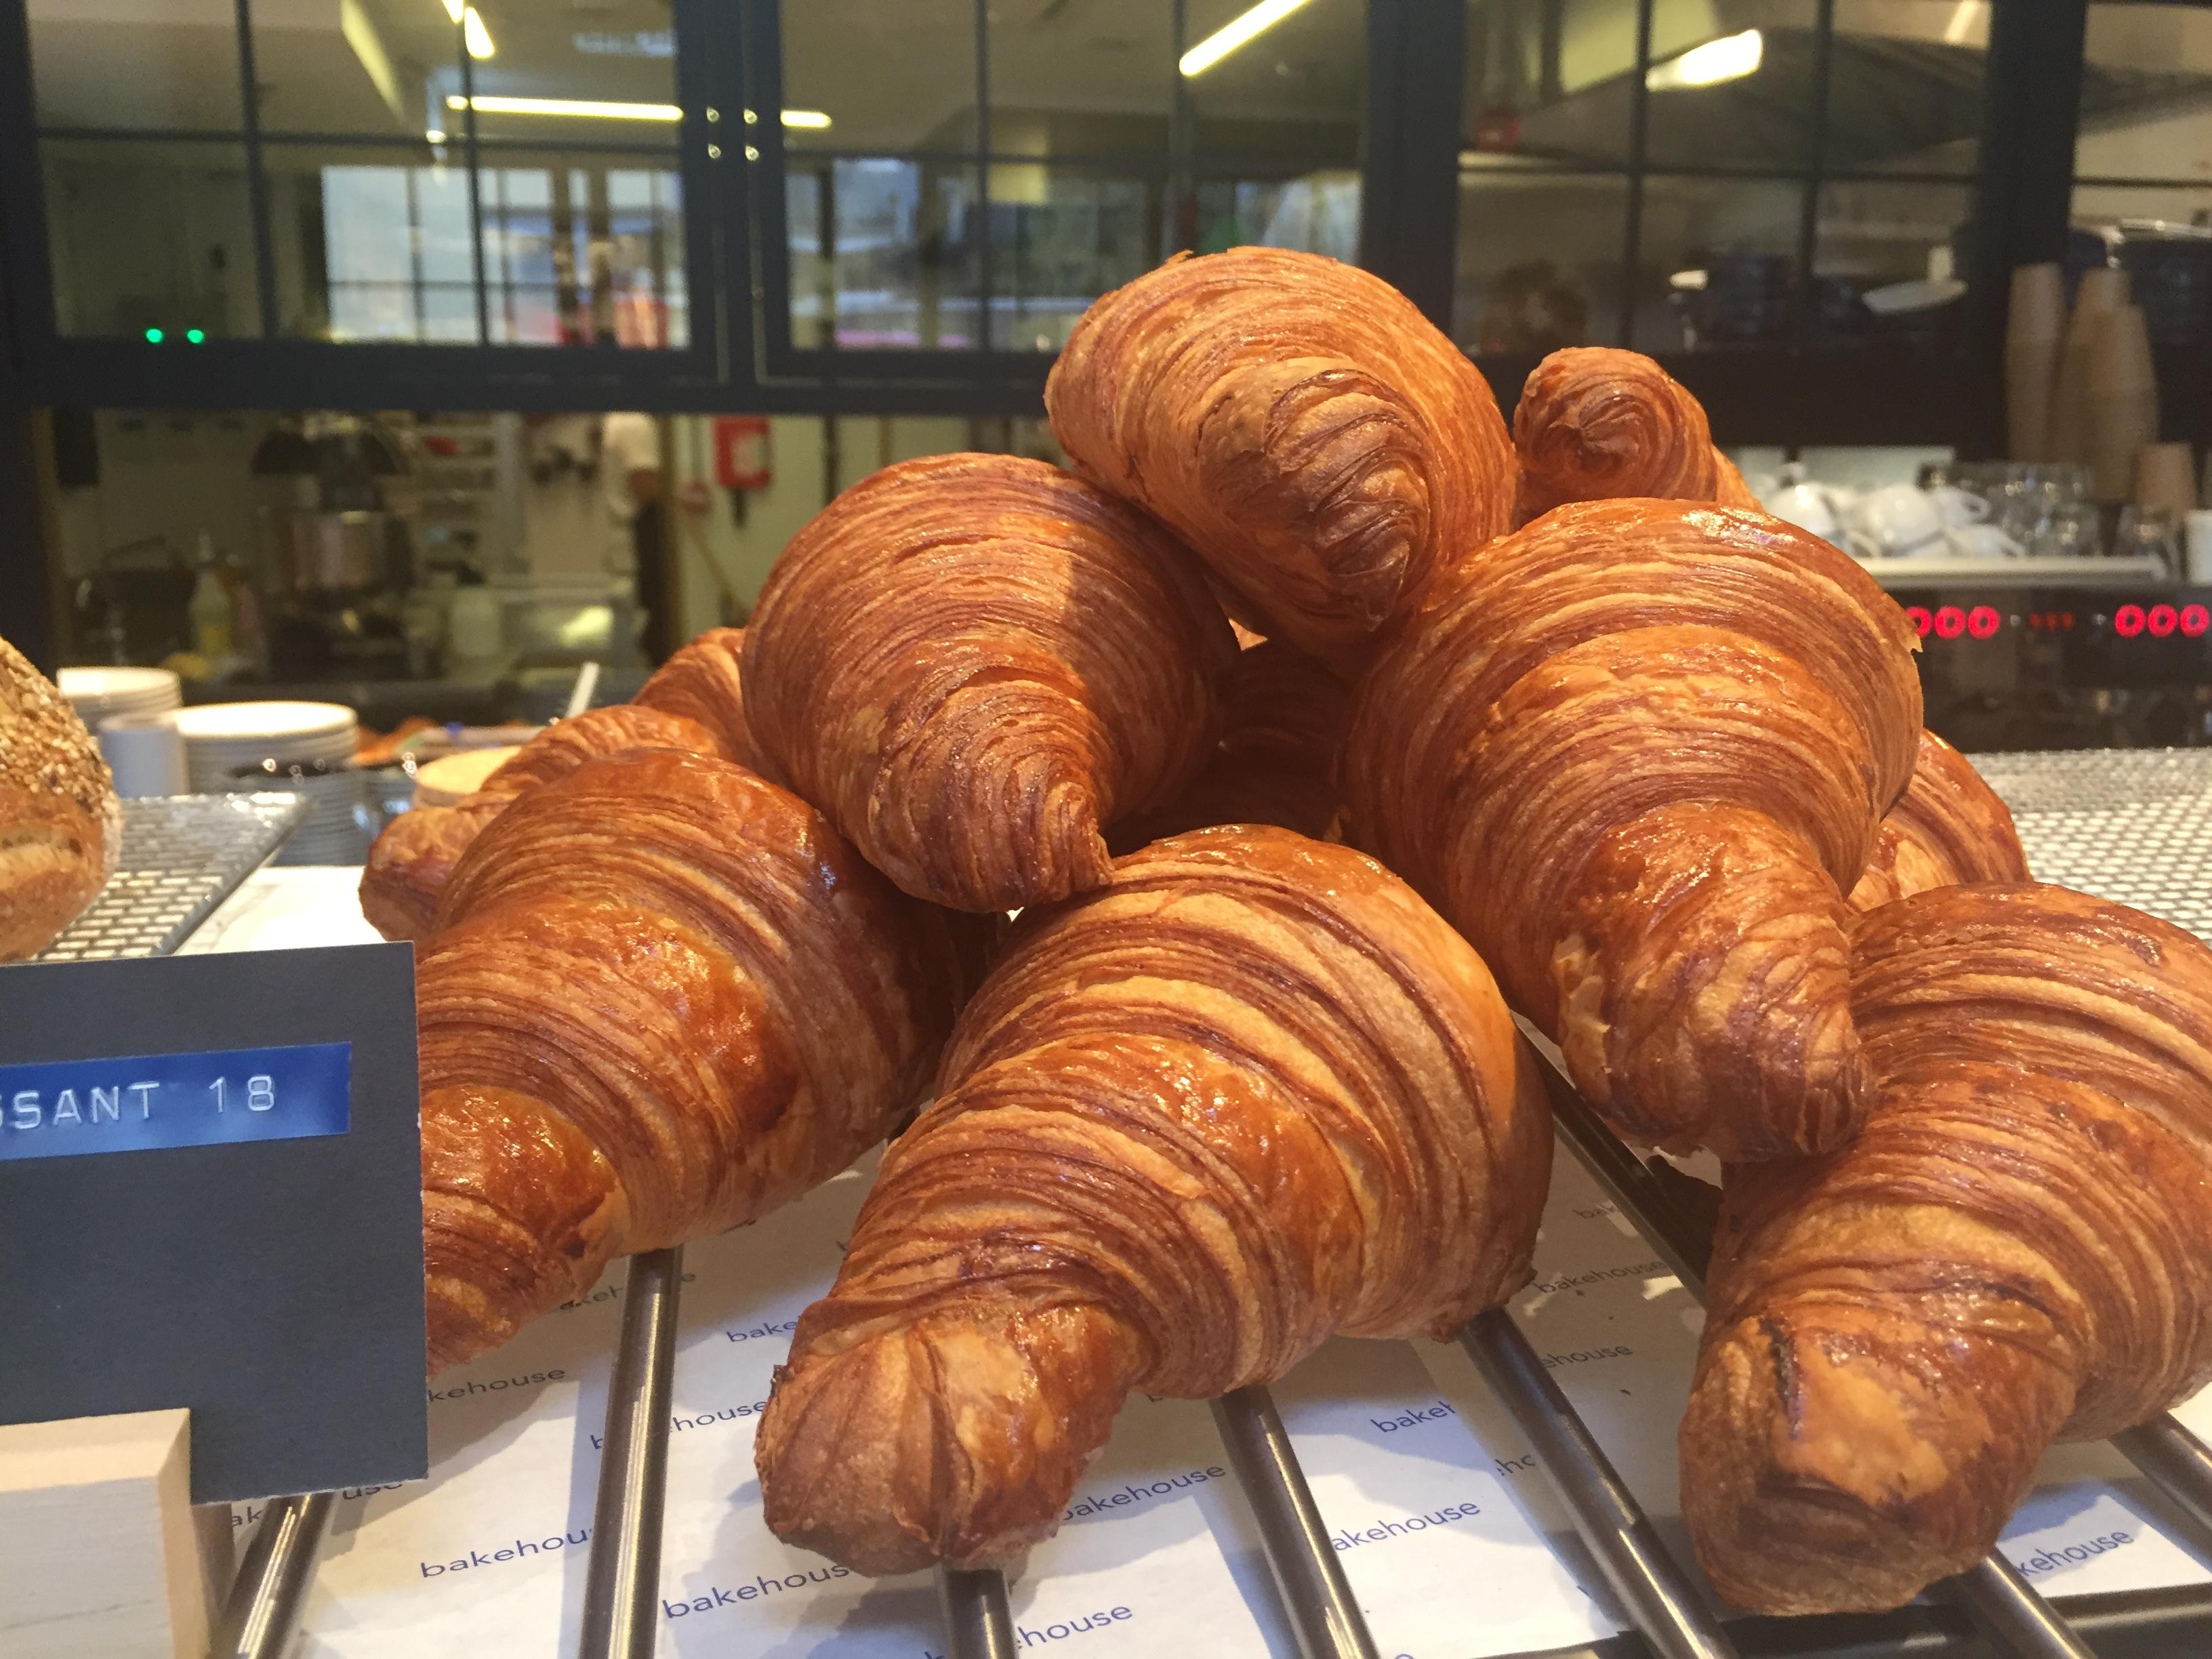 Freshly baked croissants at Bakehouse